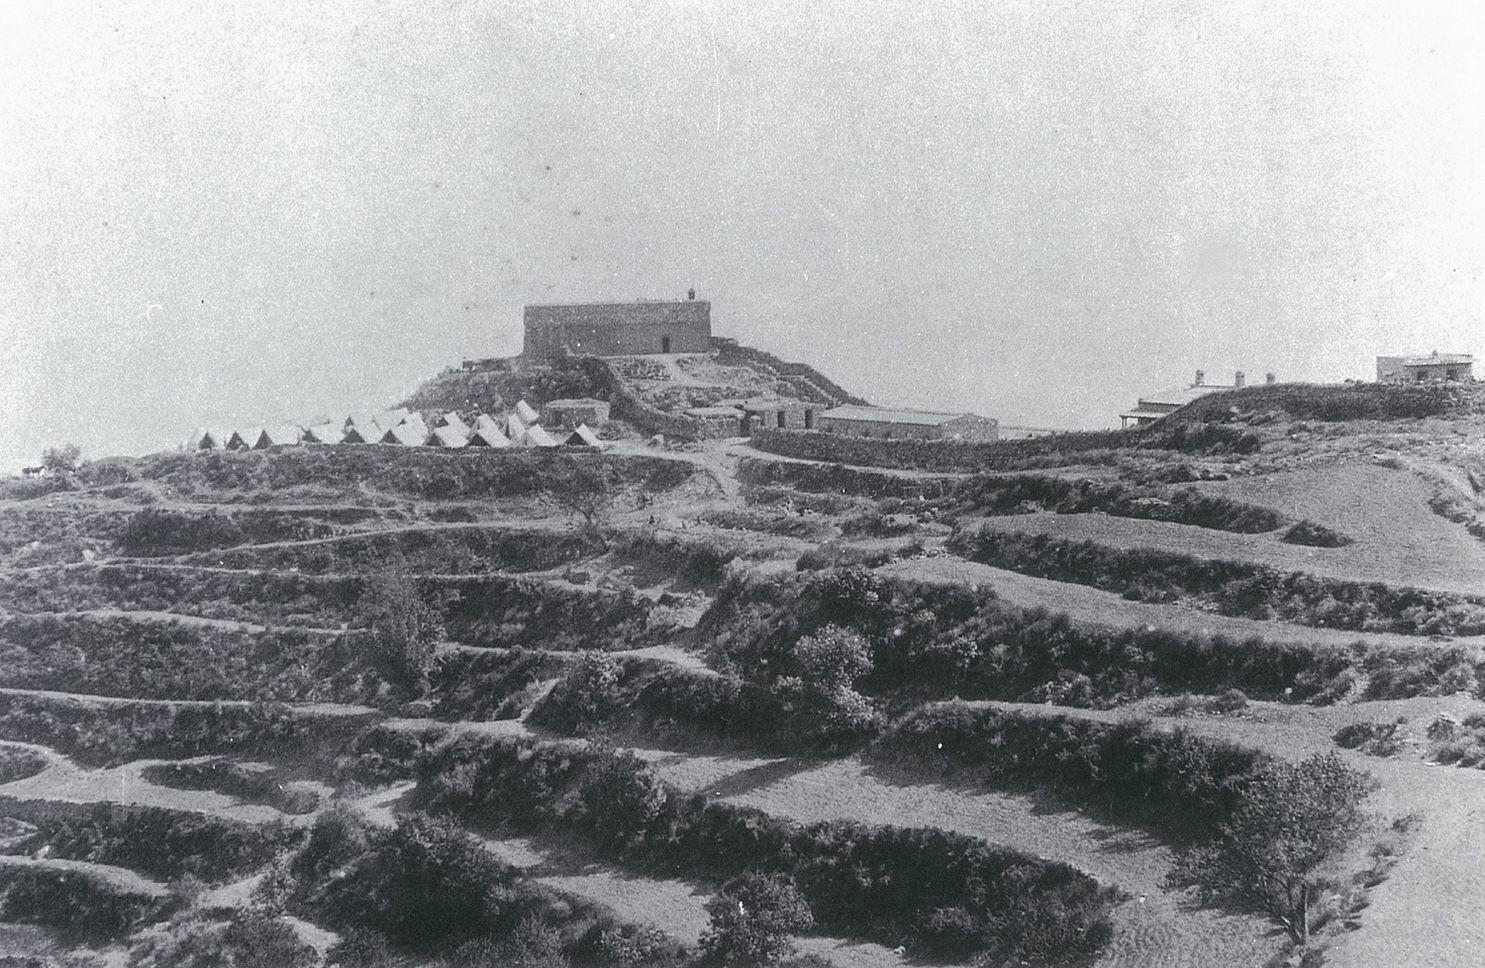 Форт Каваньяри (Гюлистан), 1897г.